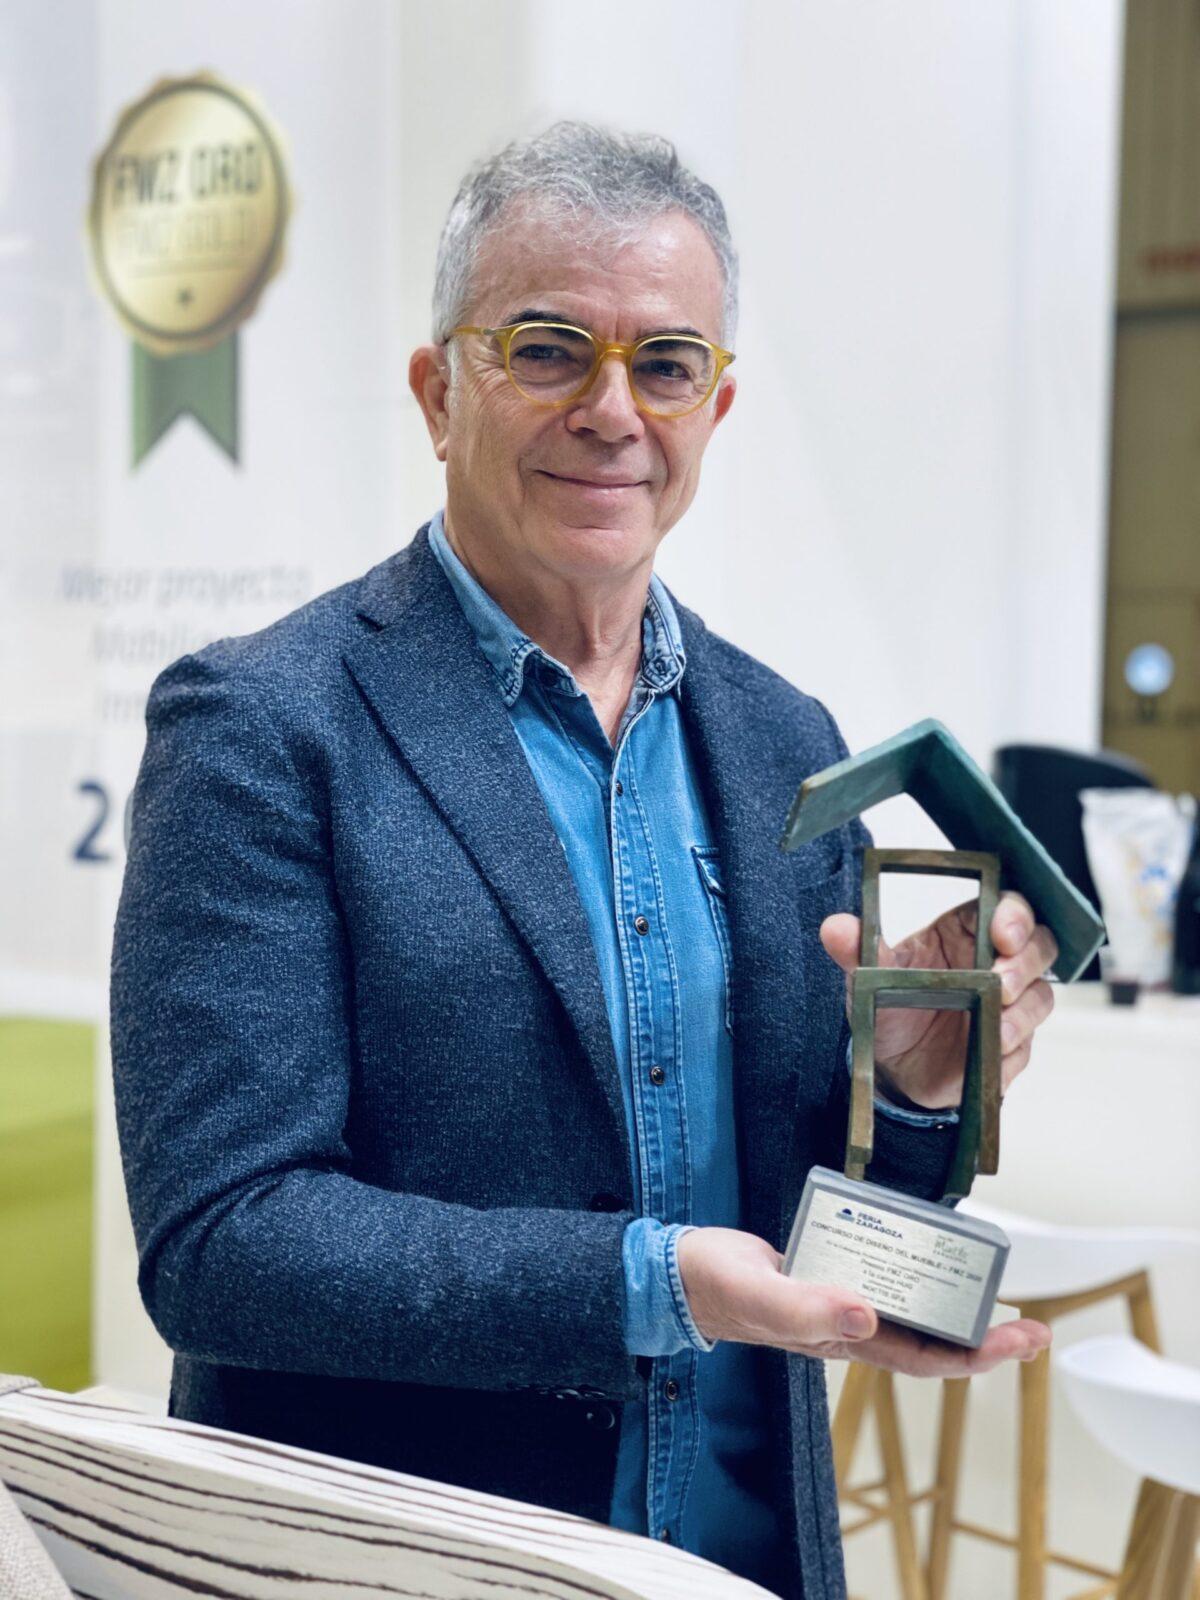 Piero Priori, Presidente Noctis spa